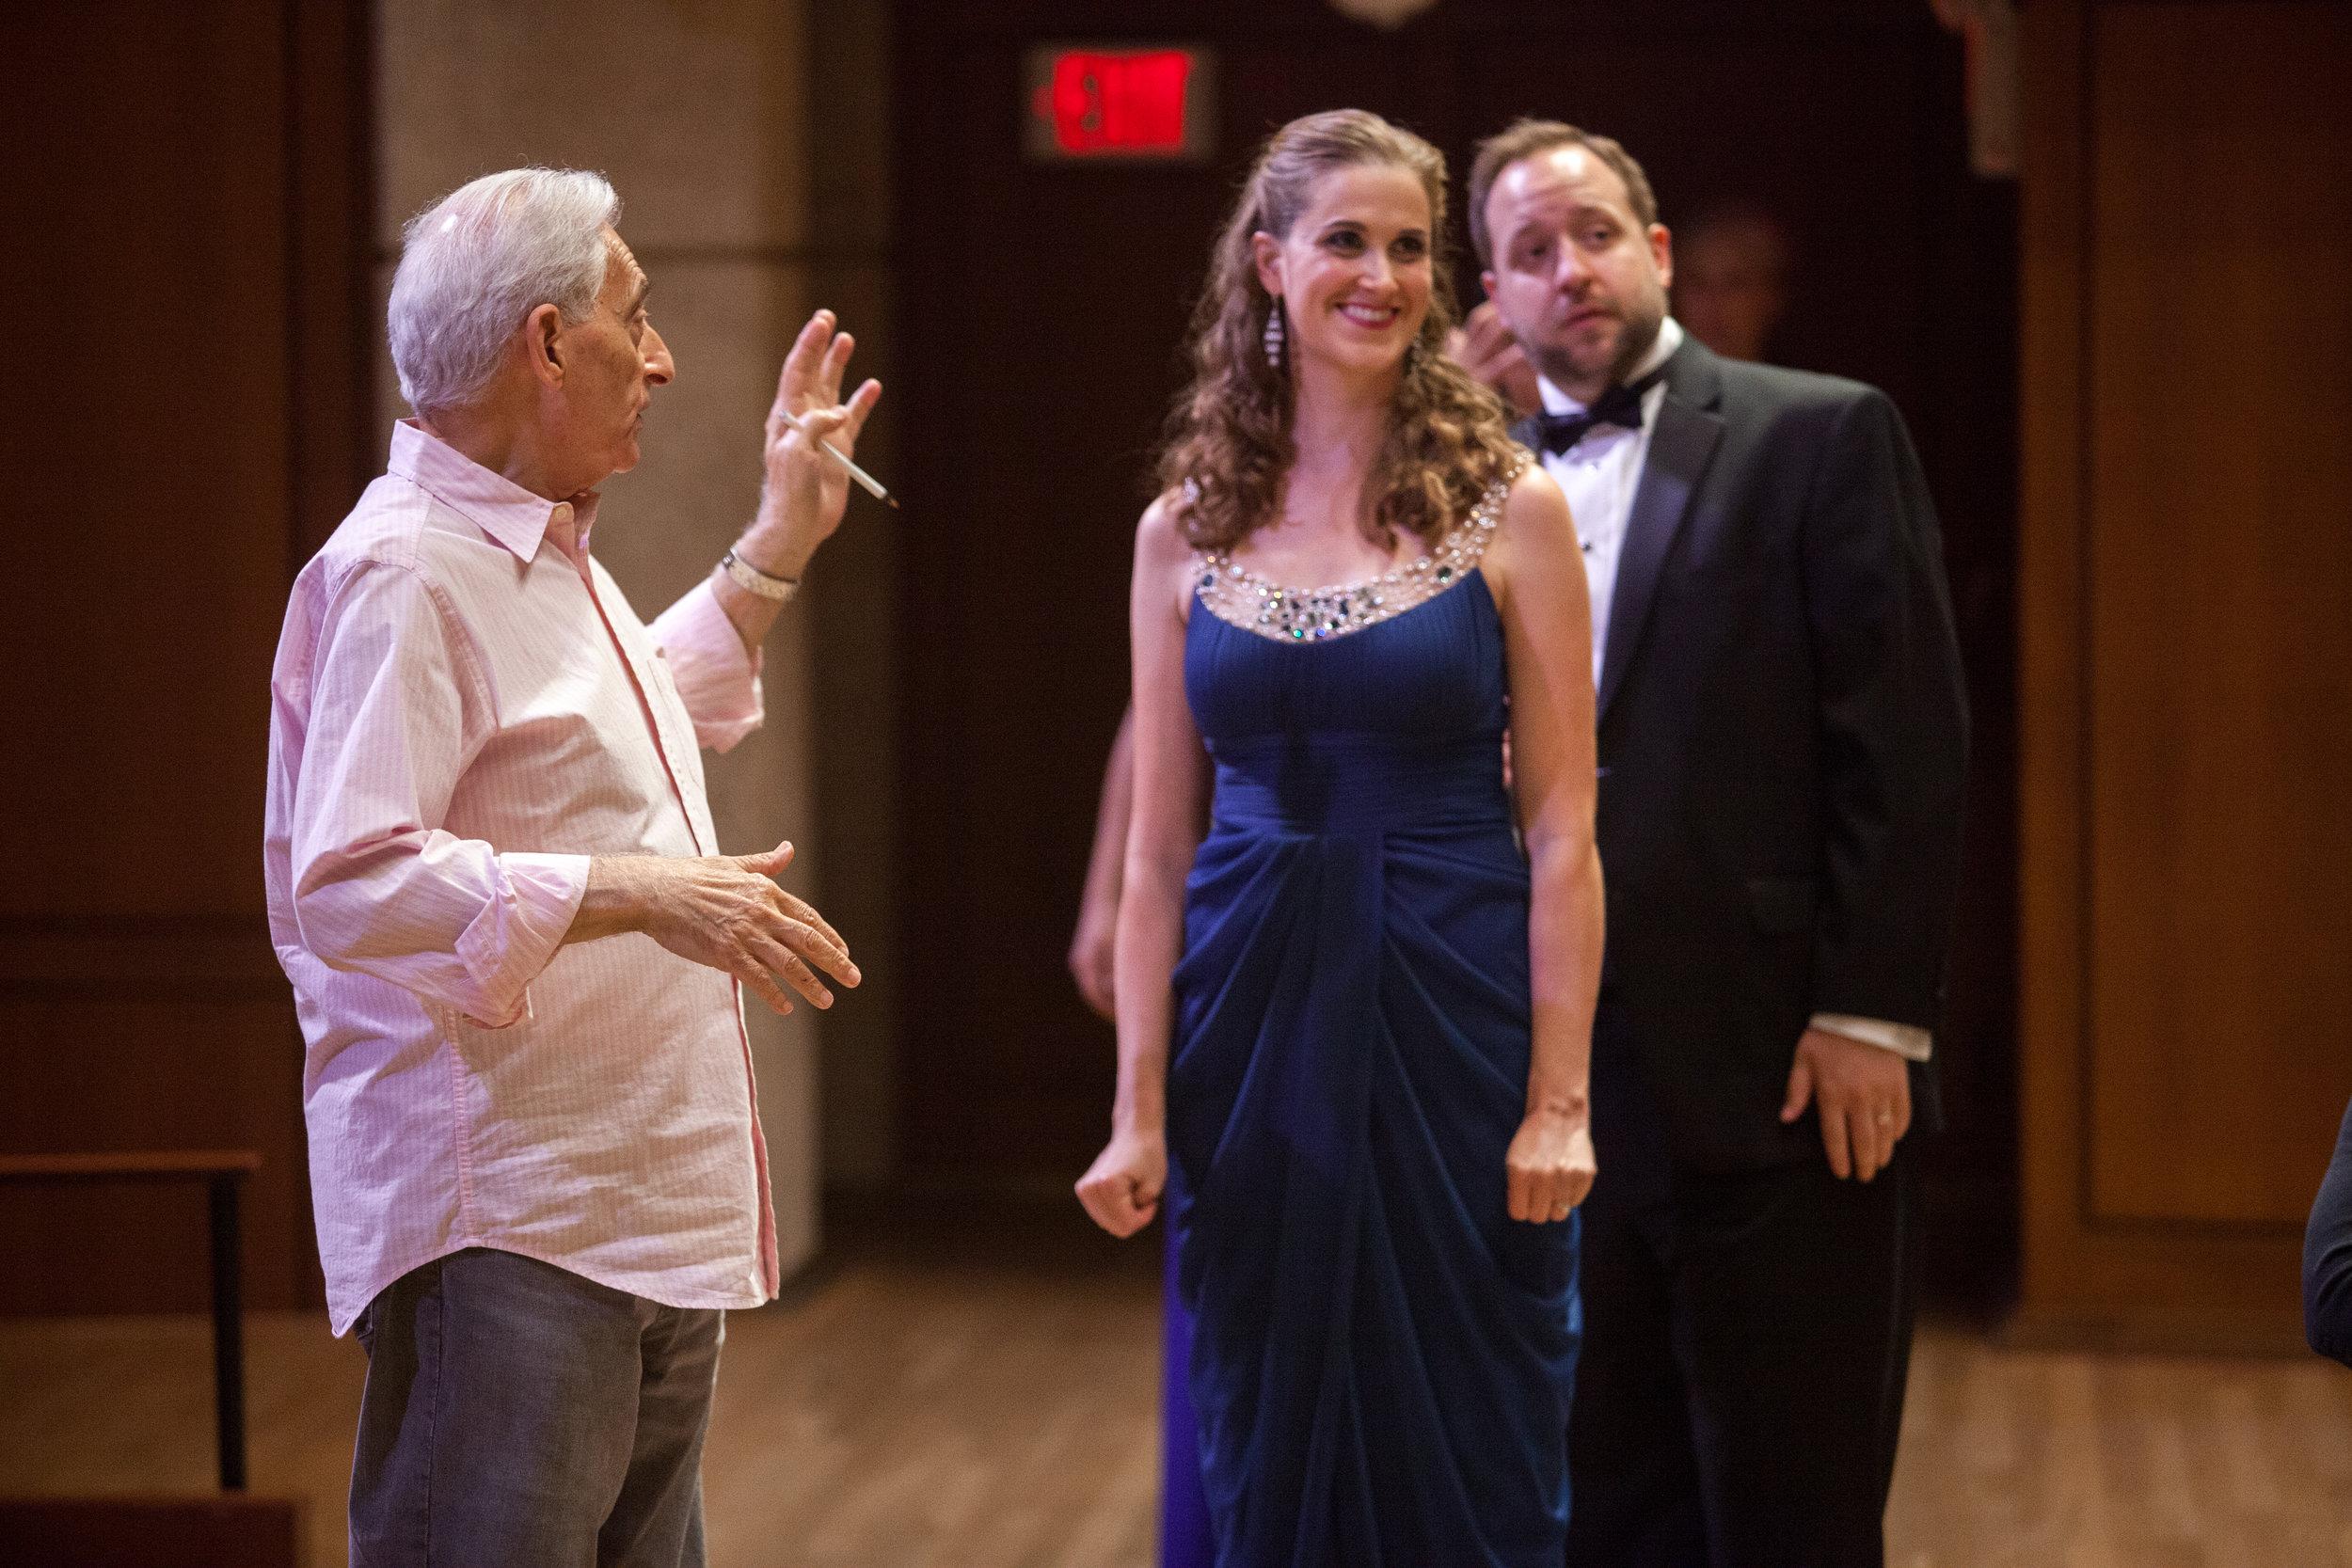 Dr. Robert DeSimone, Director of the Butler Opera Center, working with Julia Taylor, soprano, and Benjamin Cox, baritone.